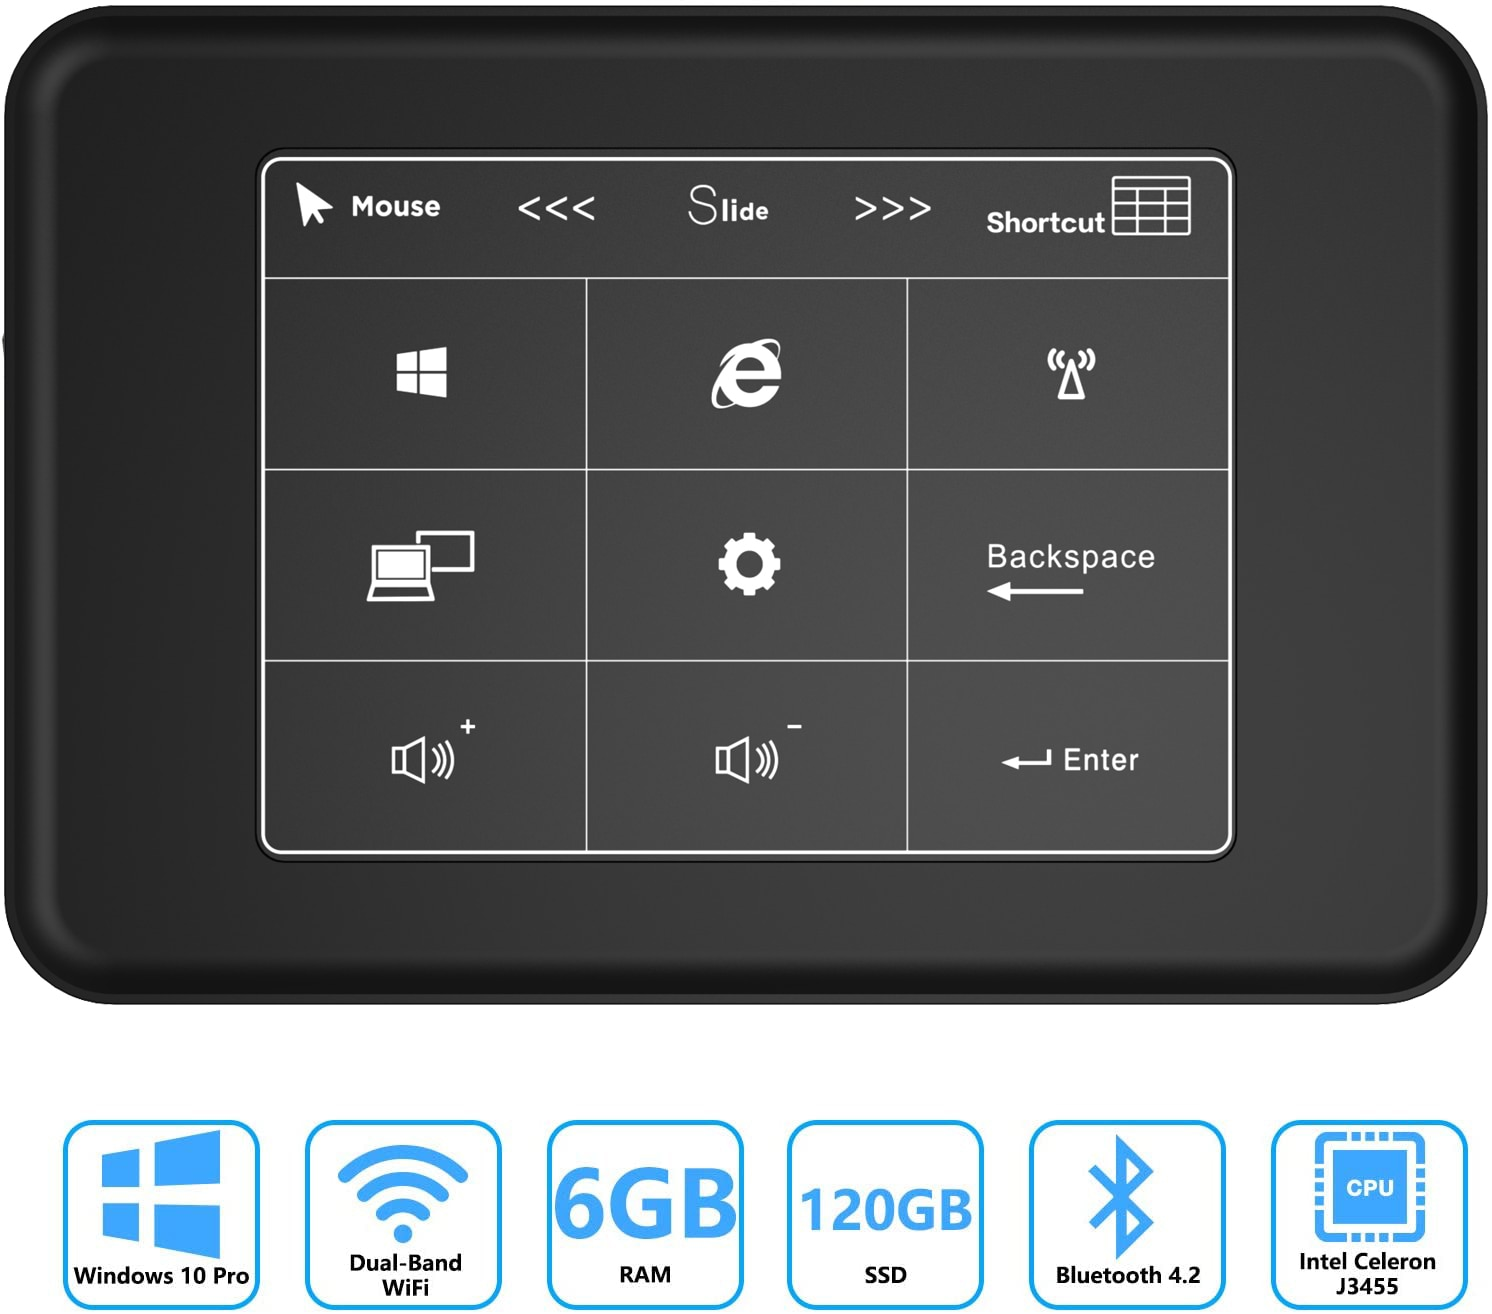 Barato mini pc windows 10 pro 6gb ram 512gb 1tb sata ssd celeron j3455 4k hd gráficos mini computador mini hdmi gigabit banda dupla